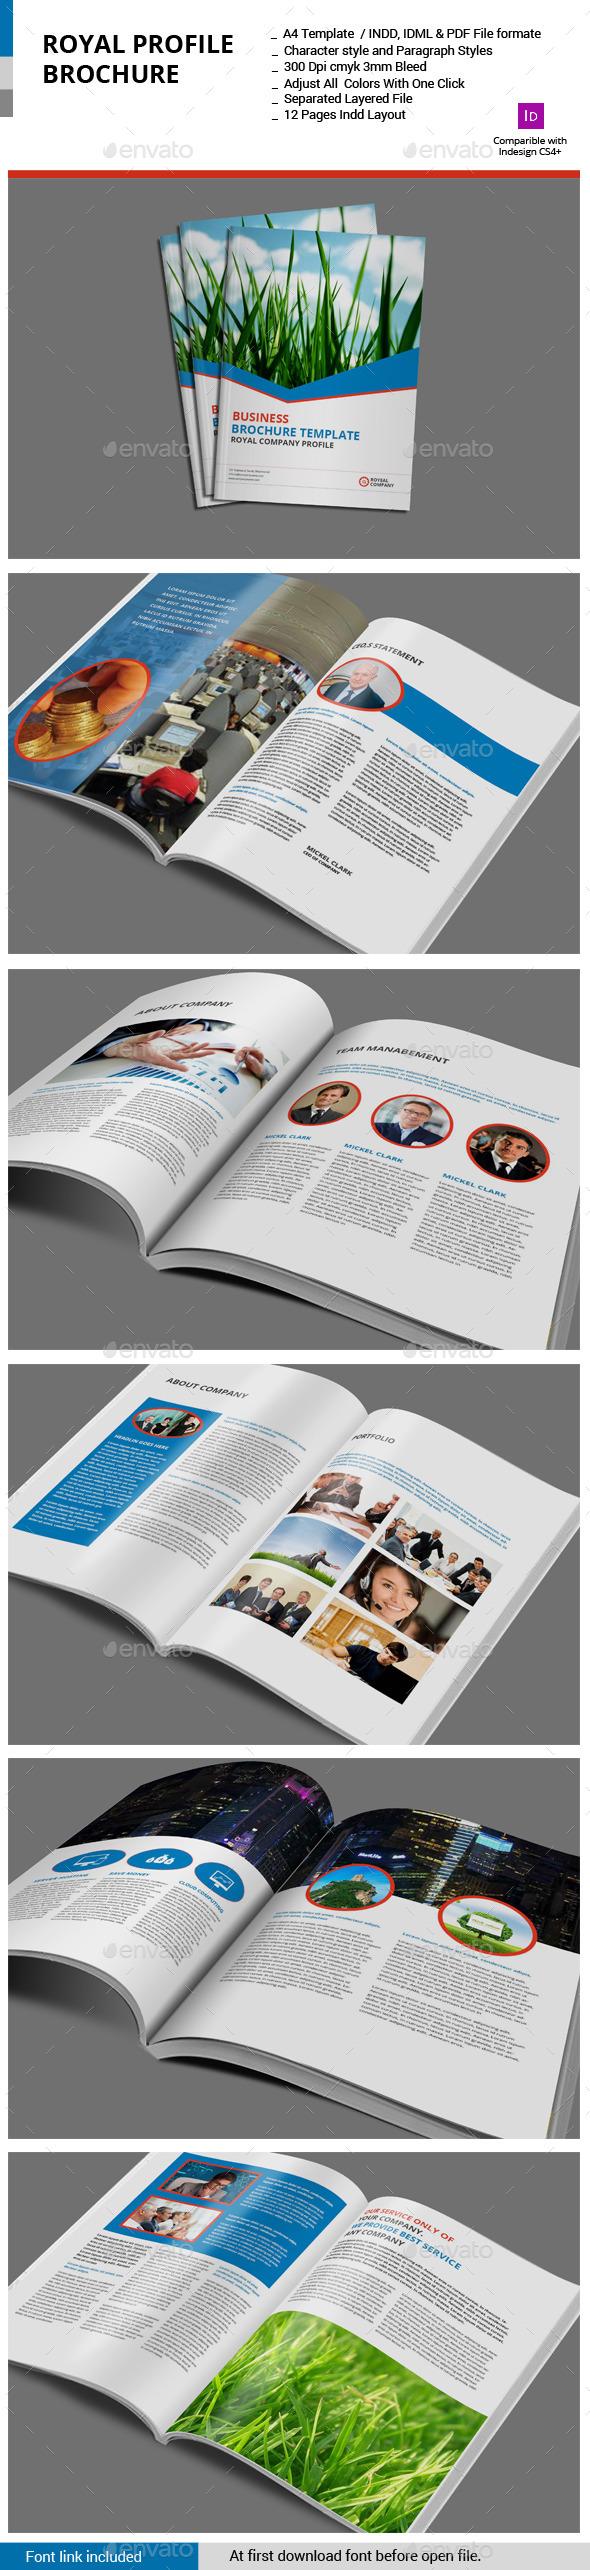 GraphicRiver Royal Profile Brochure 11405952